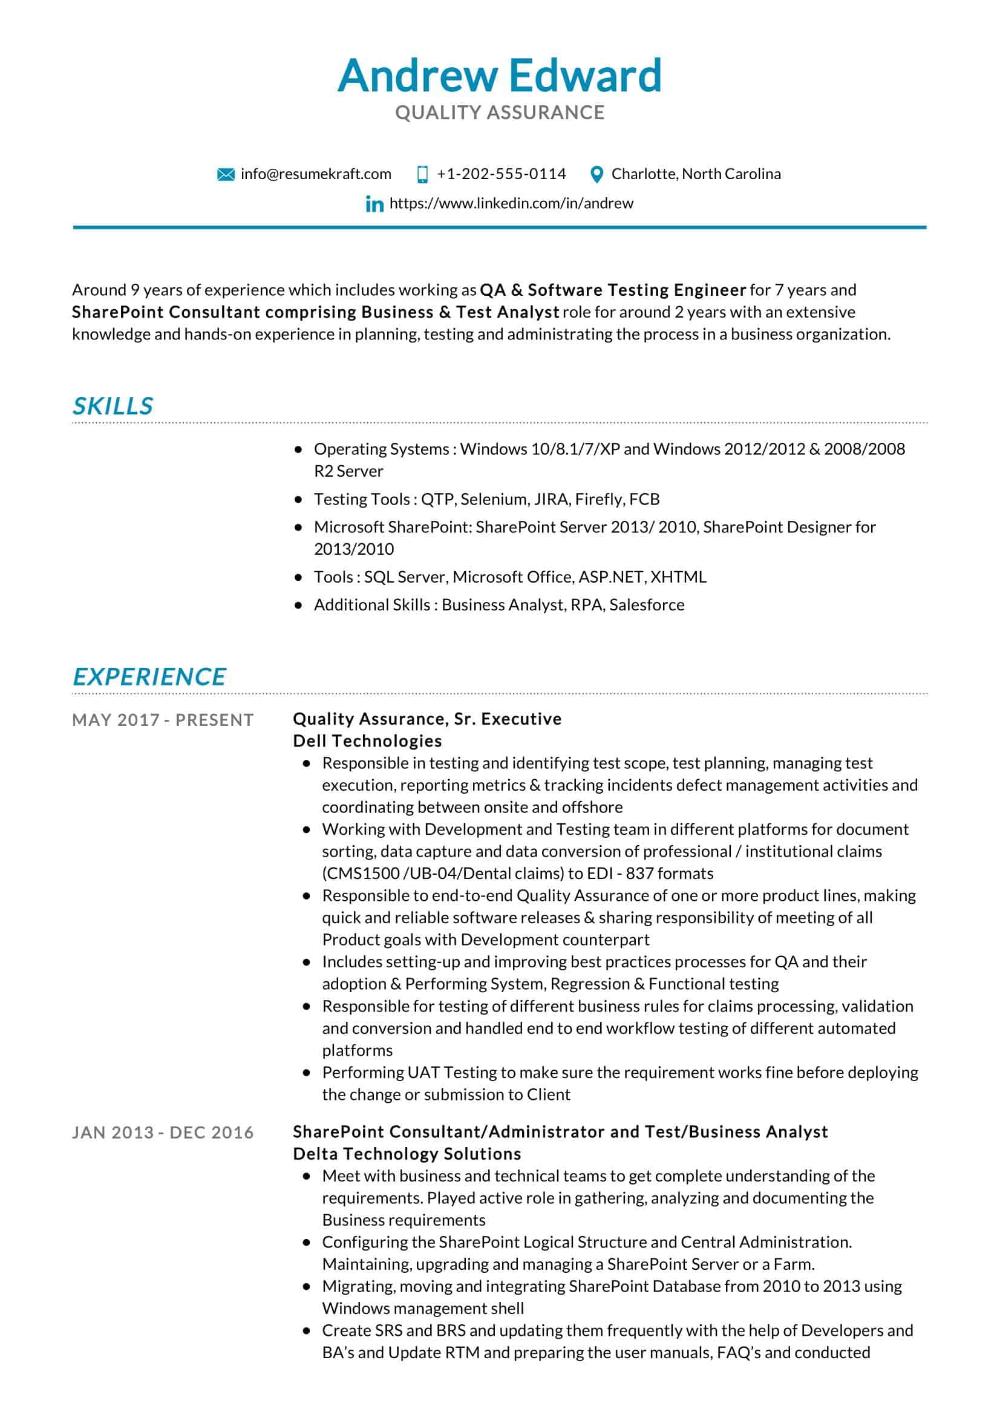 100 Professional Resume Samples For 2020 Resumekraft Resume Examples Sample Resume Resume